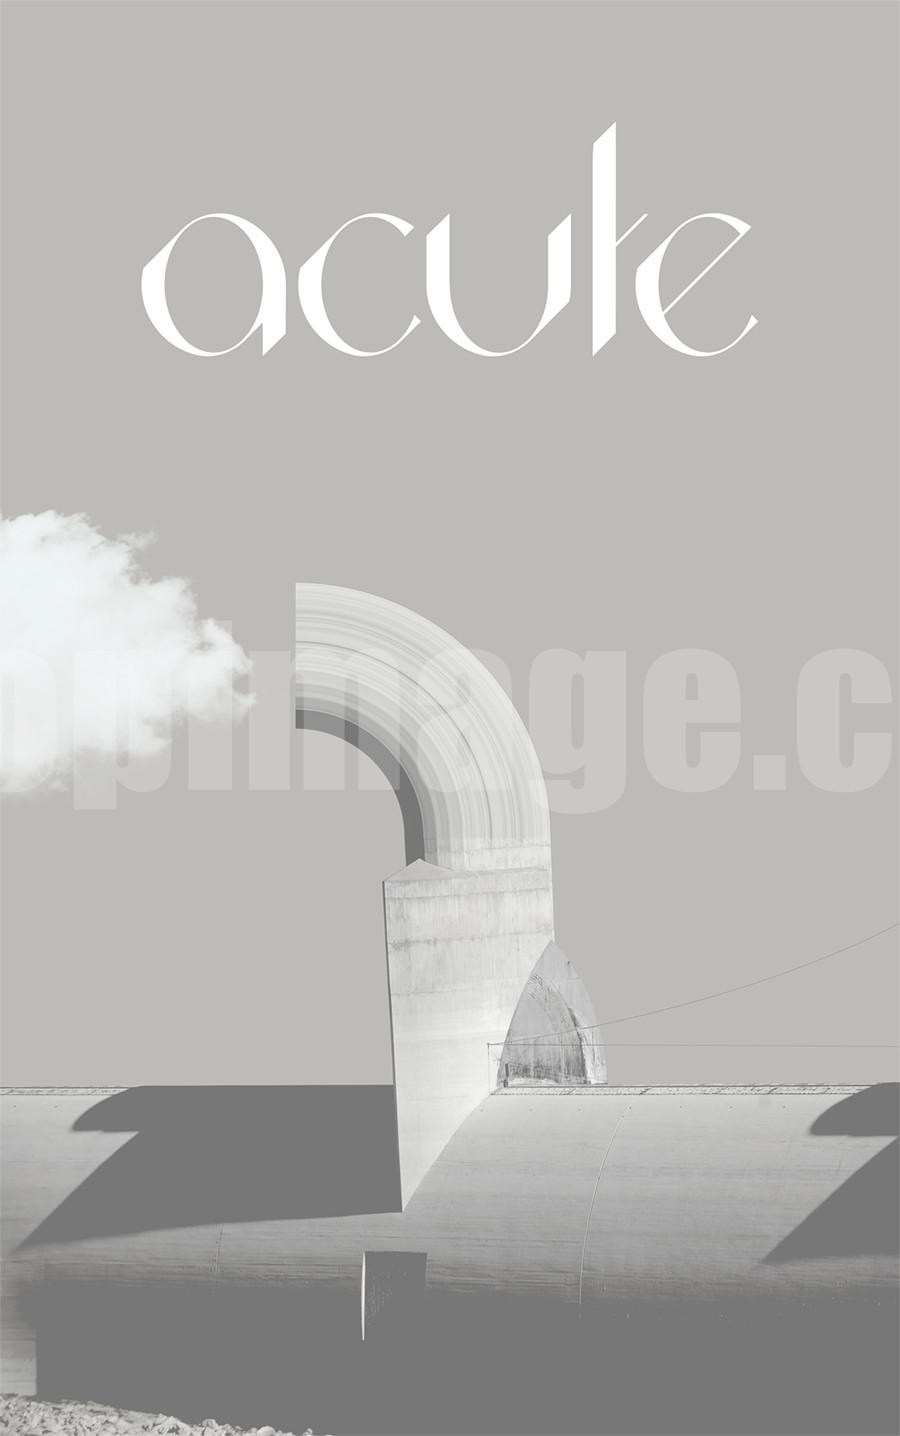 Acute创意logo现代简约好看的英文字体